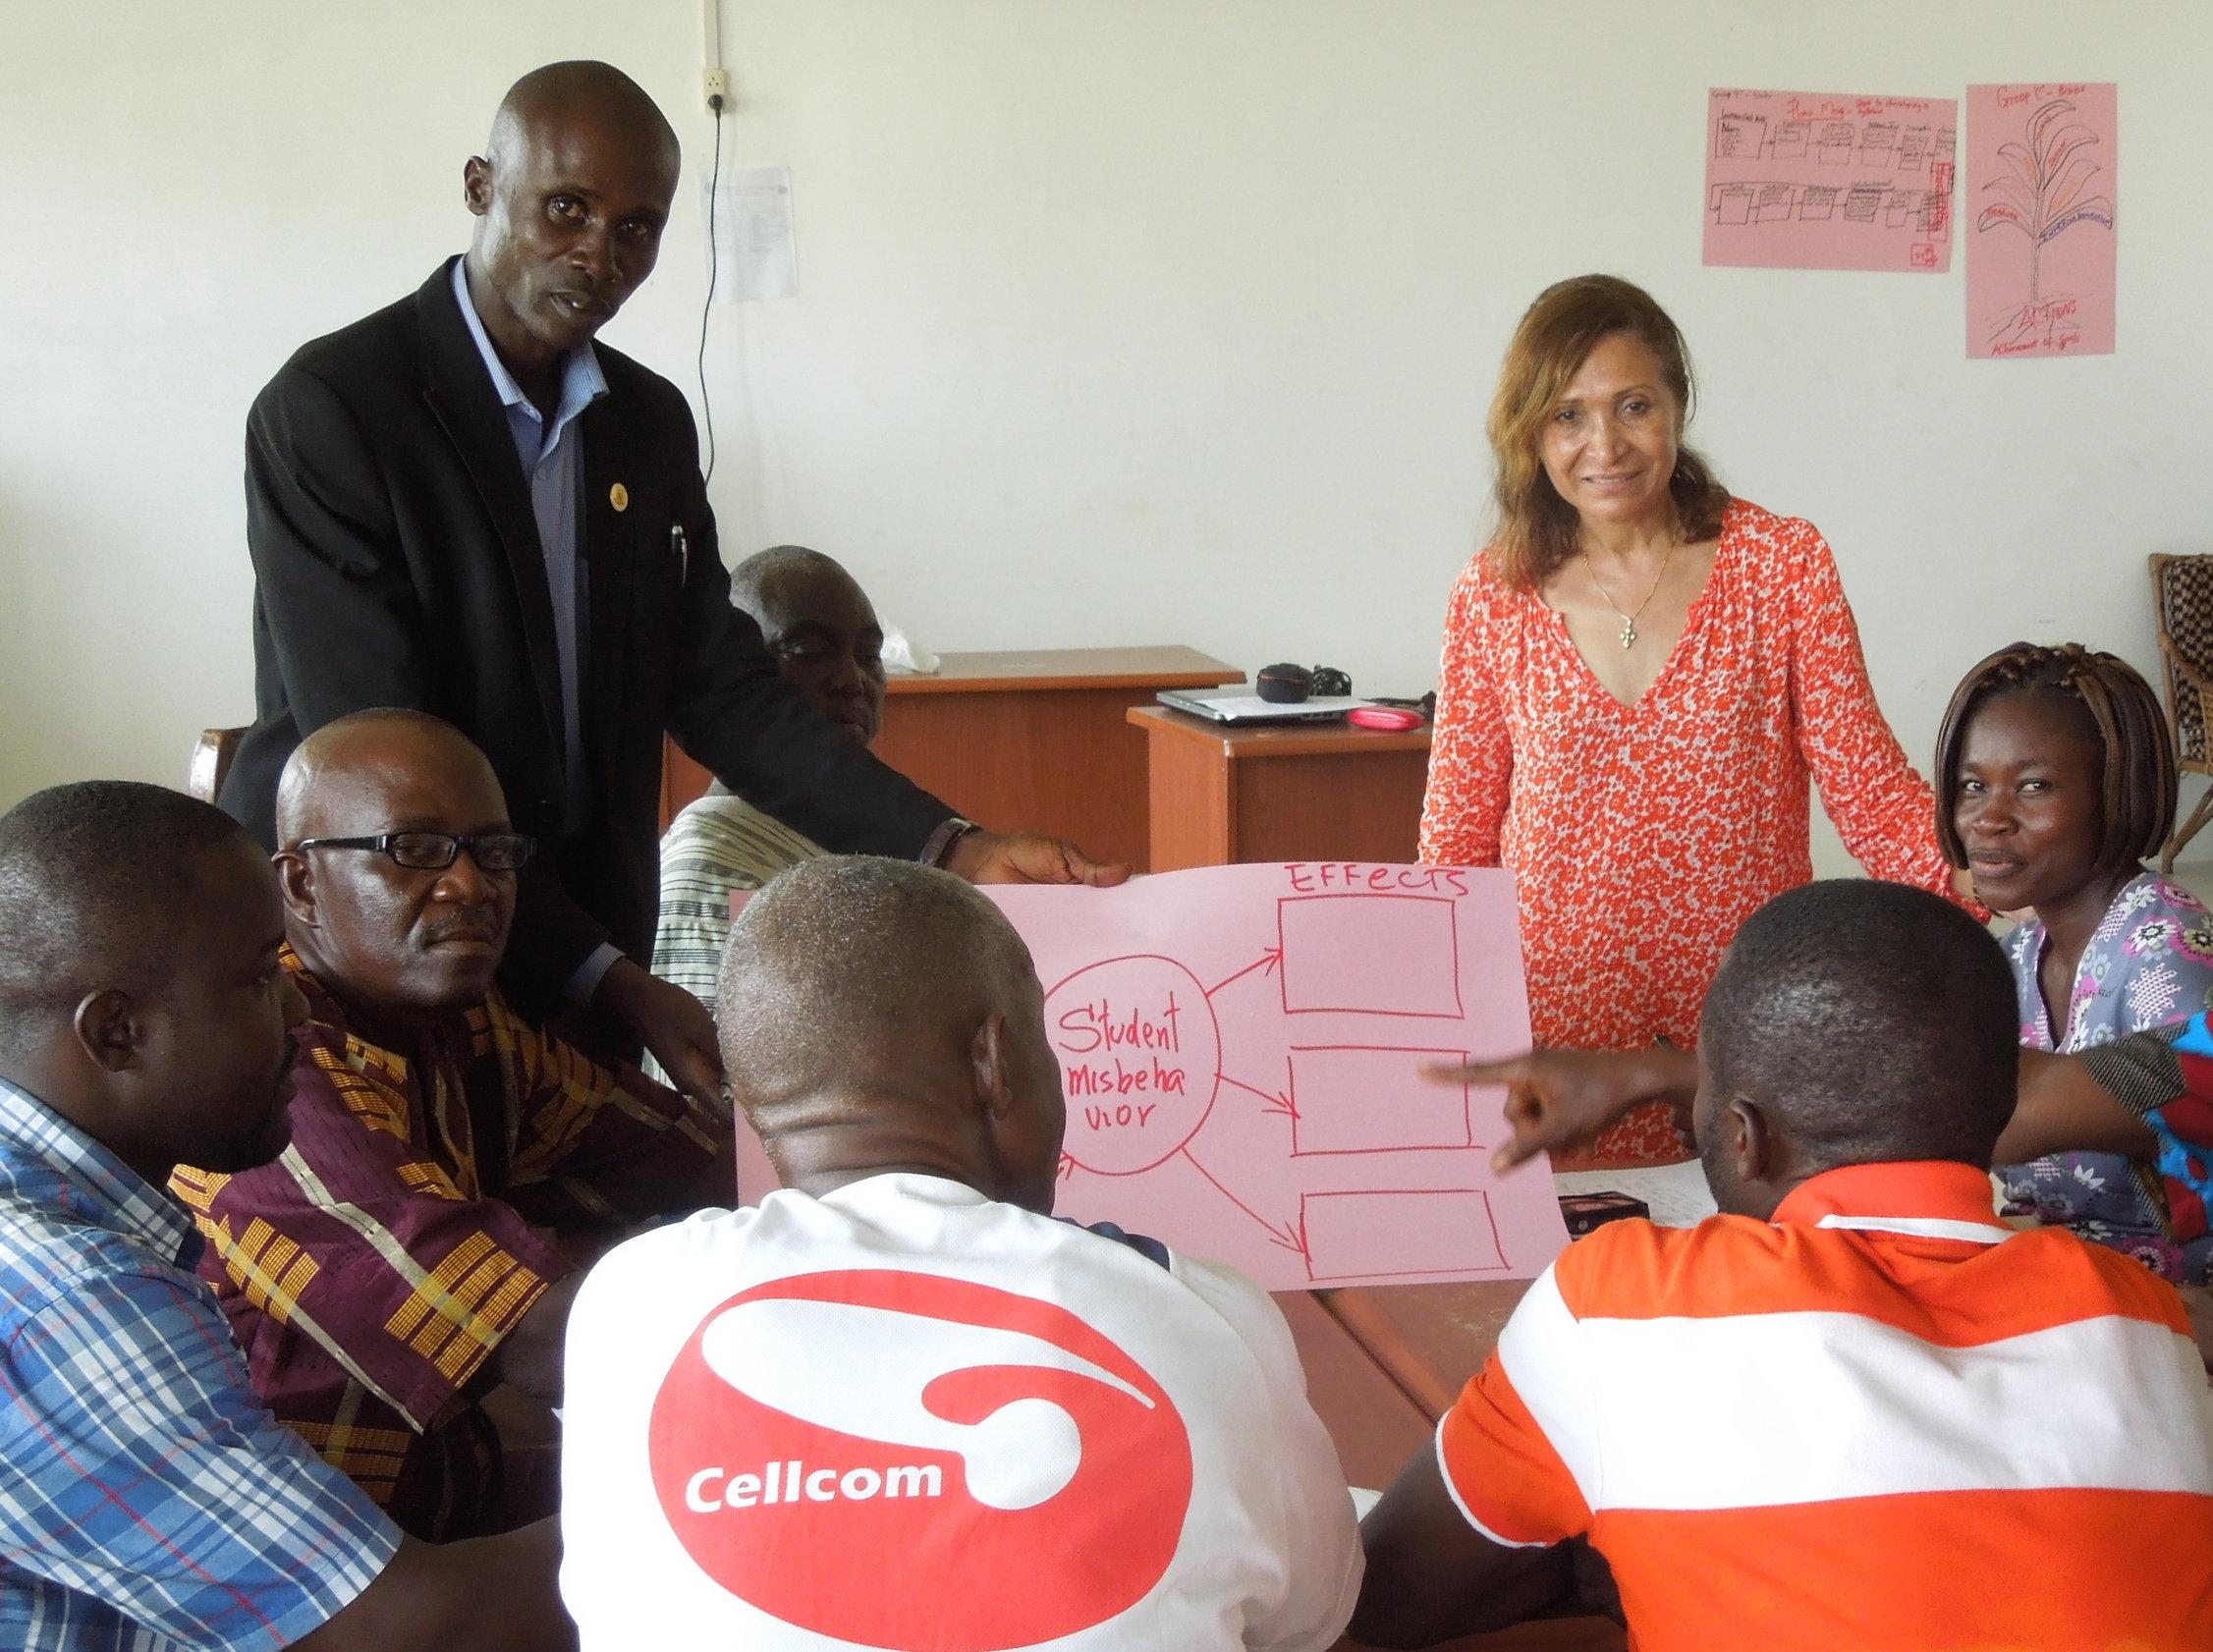 Gil-Garcia conducting a teacher training at Grand Bassa Community College, Liberia.